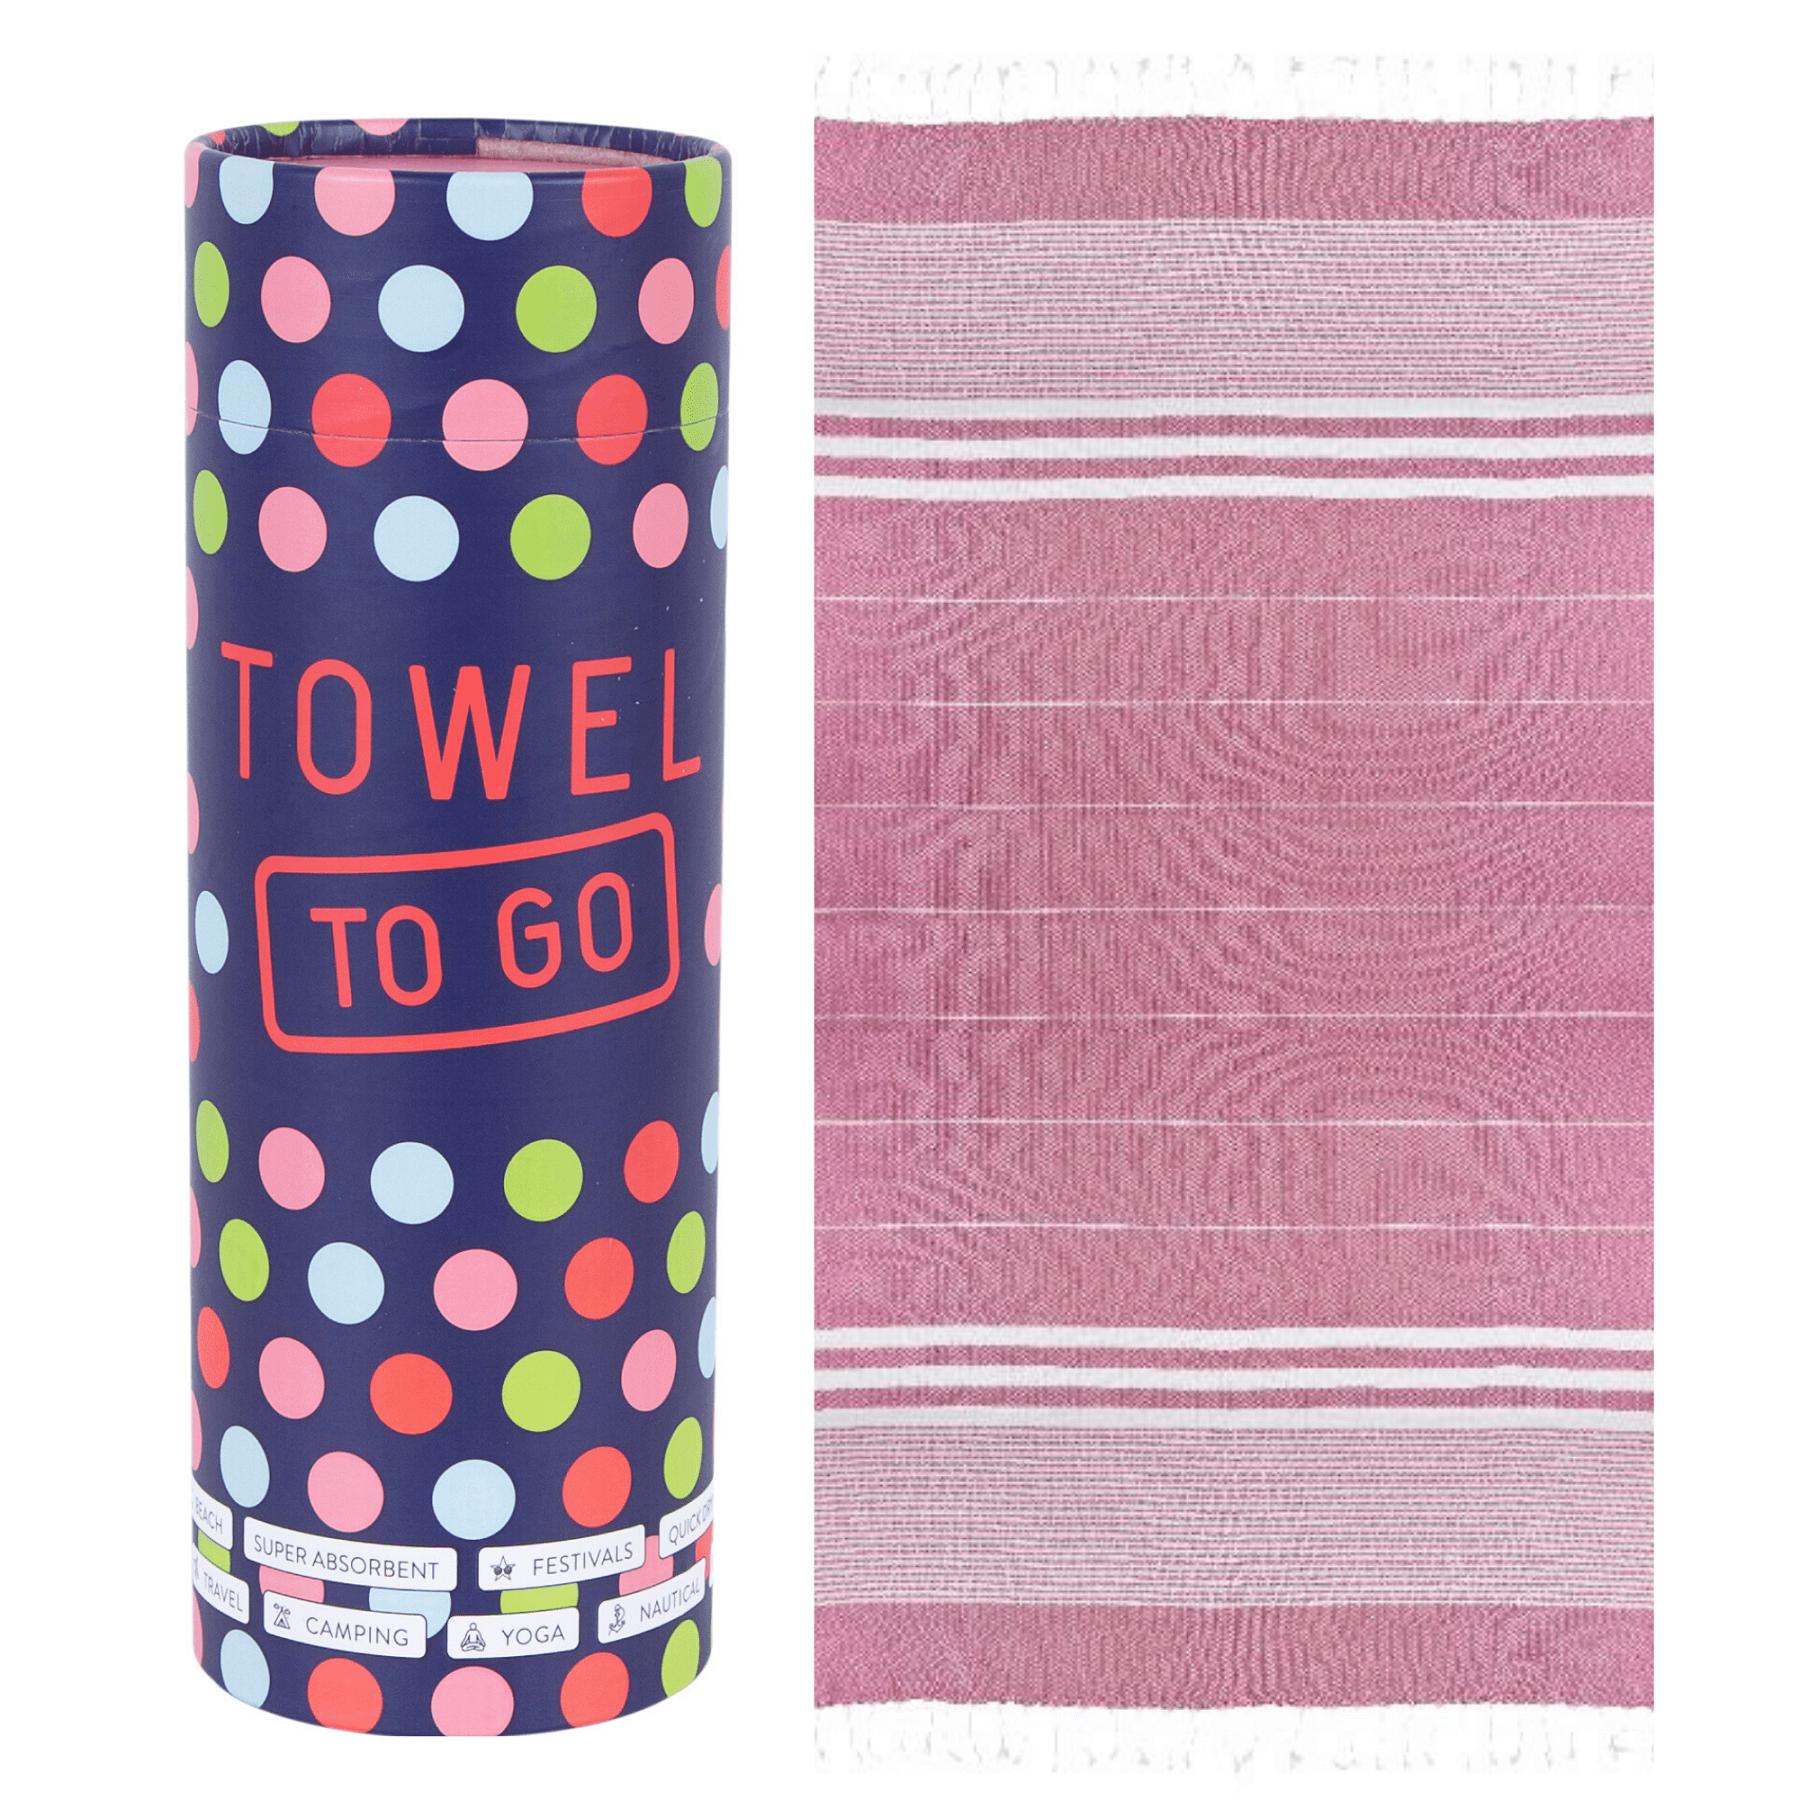 Towel to Go - Hammam towel in Fushia